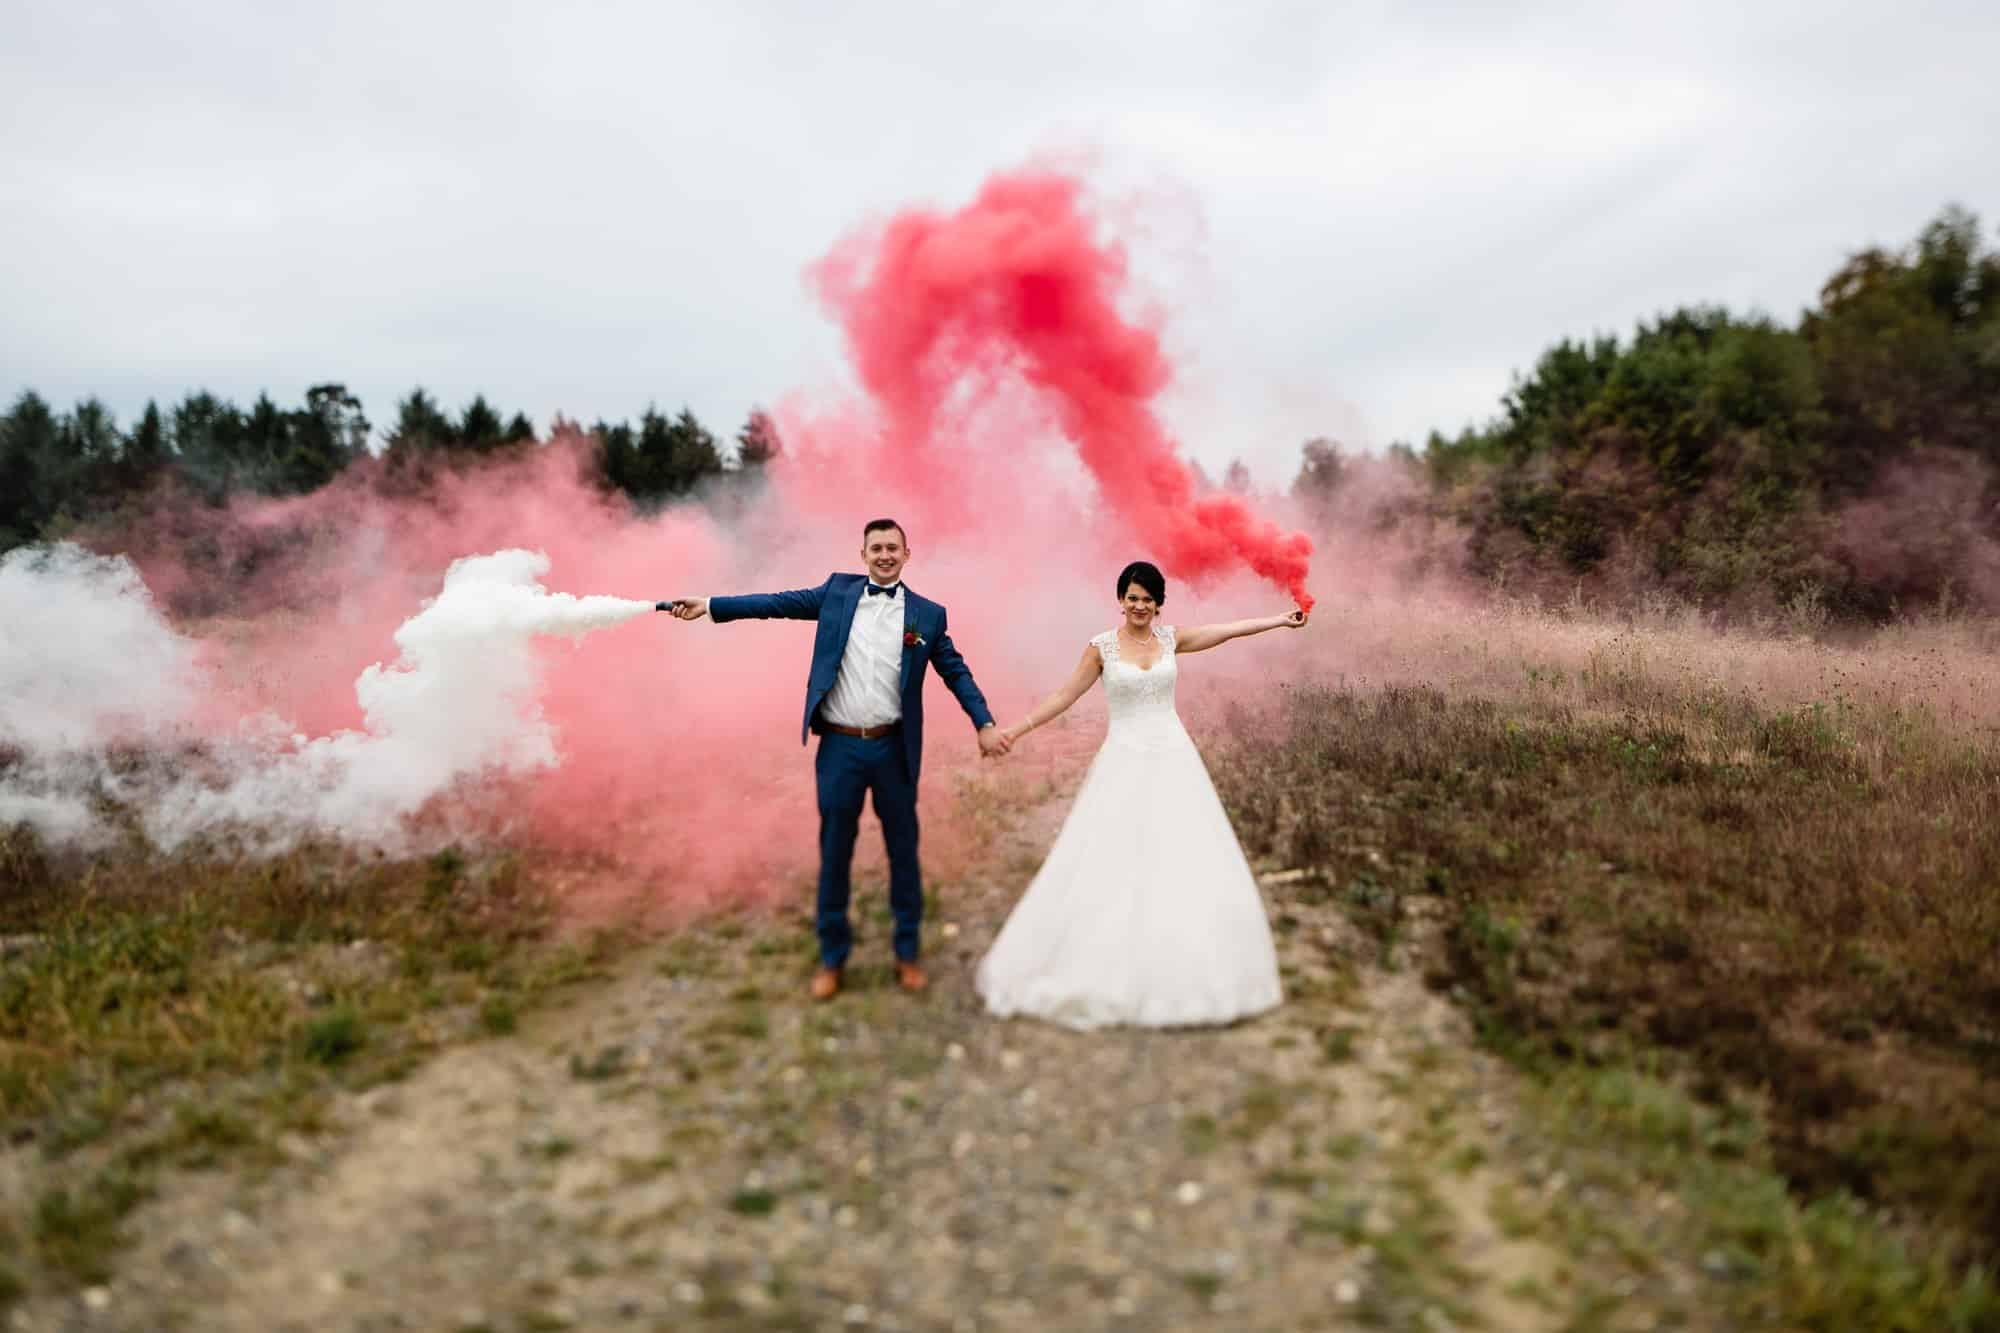 Hochzeitsfotograf Birnauer Oberhof am Bodensee